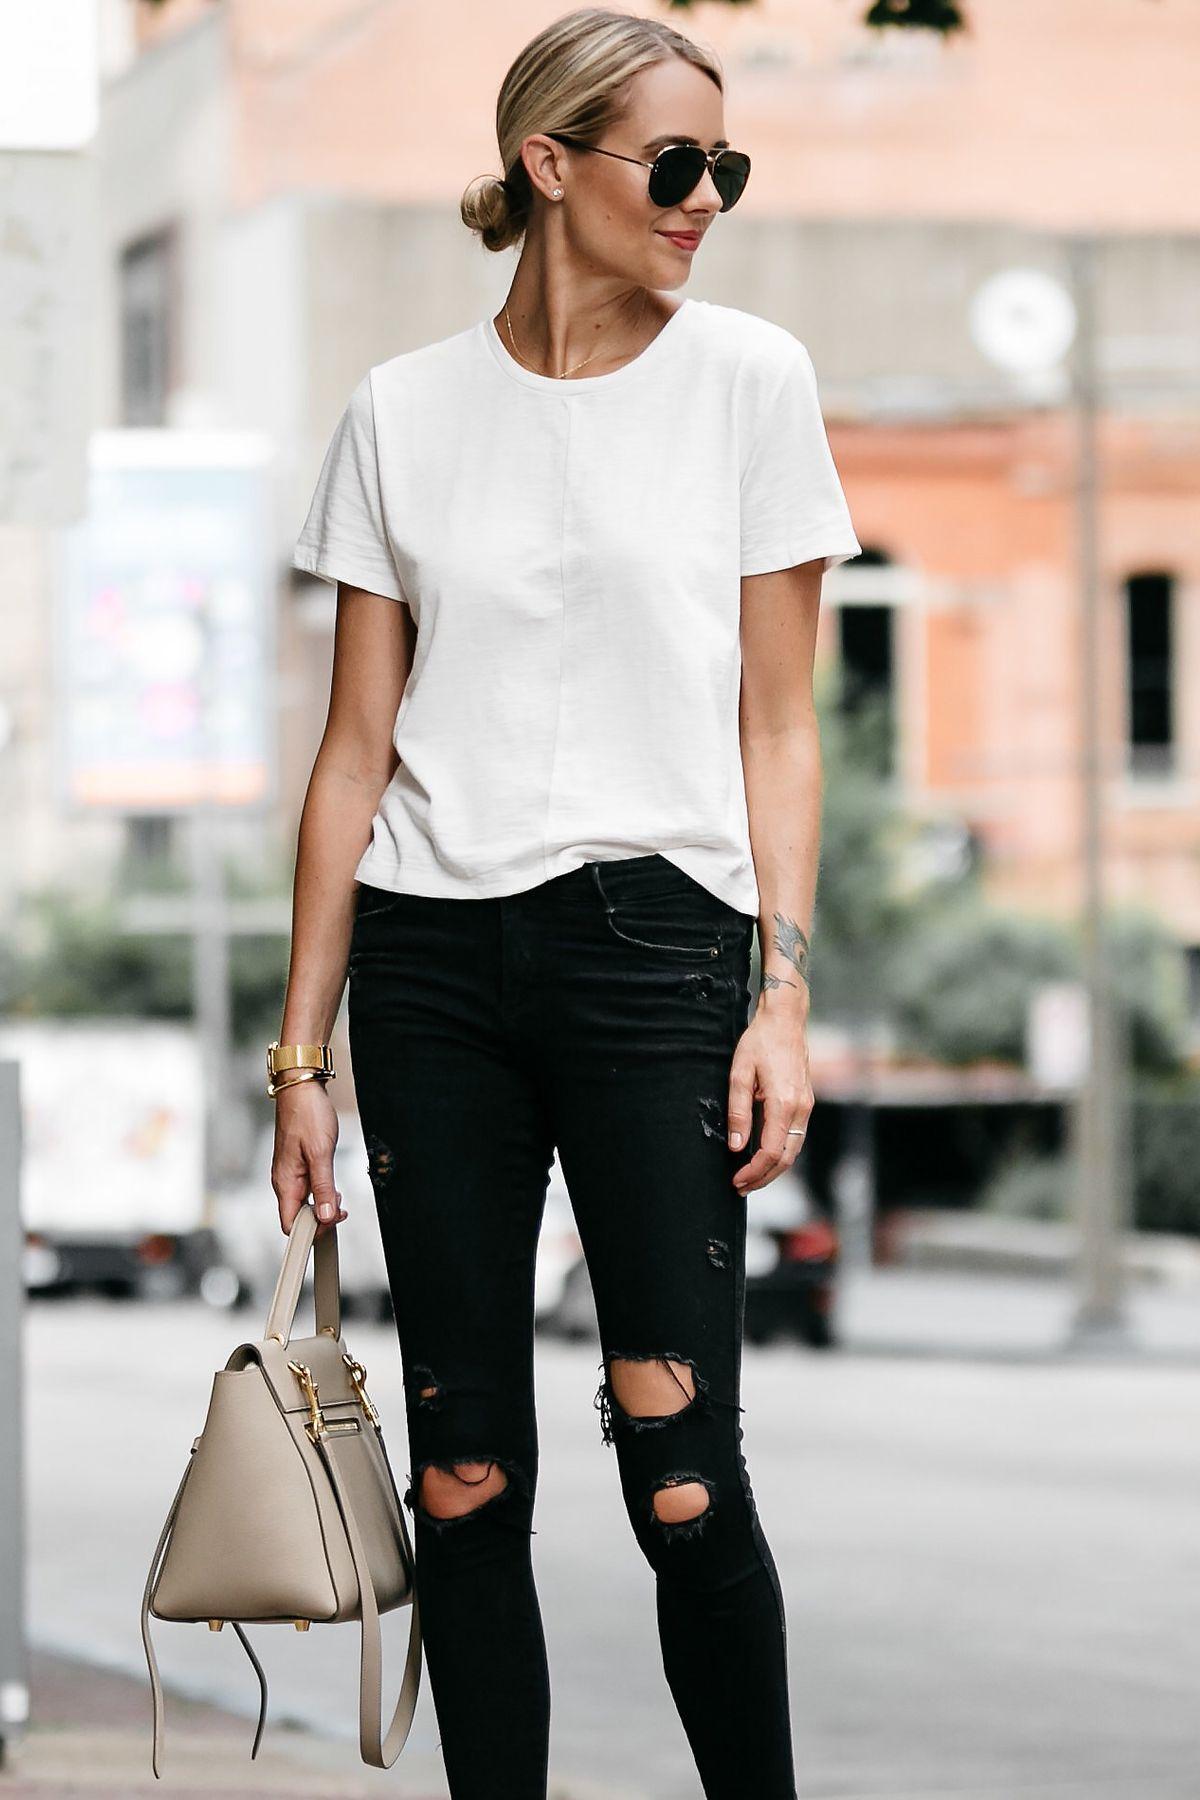 70ef452c3d8 Blonde woman wearing everlane white tshirt zara black ripped skinny jeans  outfit celine belt back street style dallas blogger fashion blogger